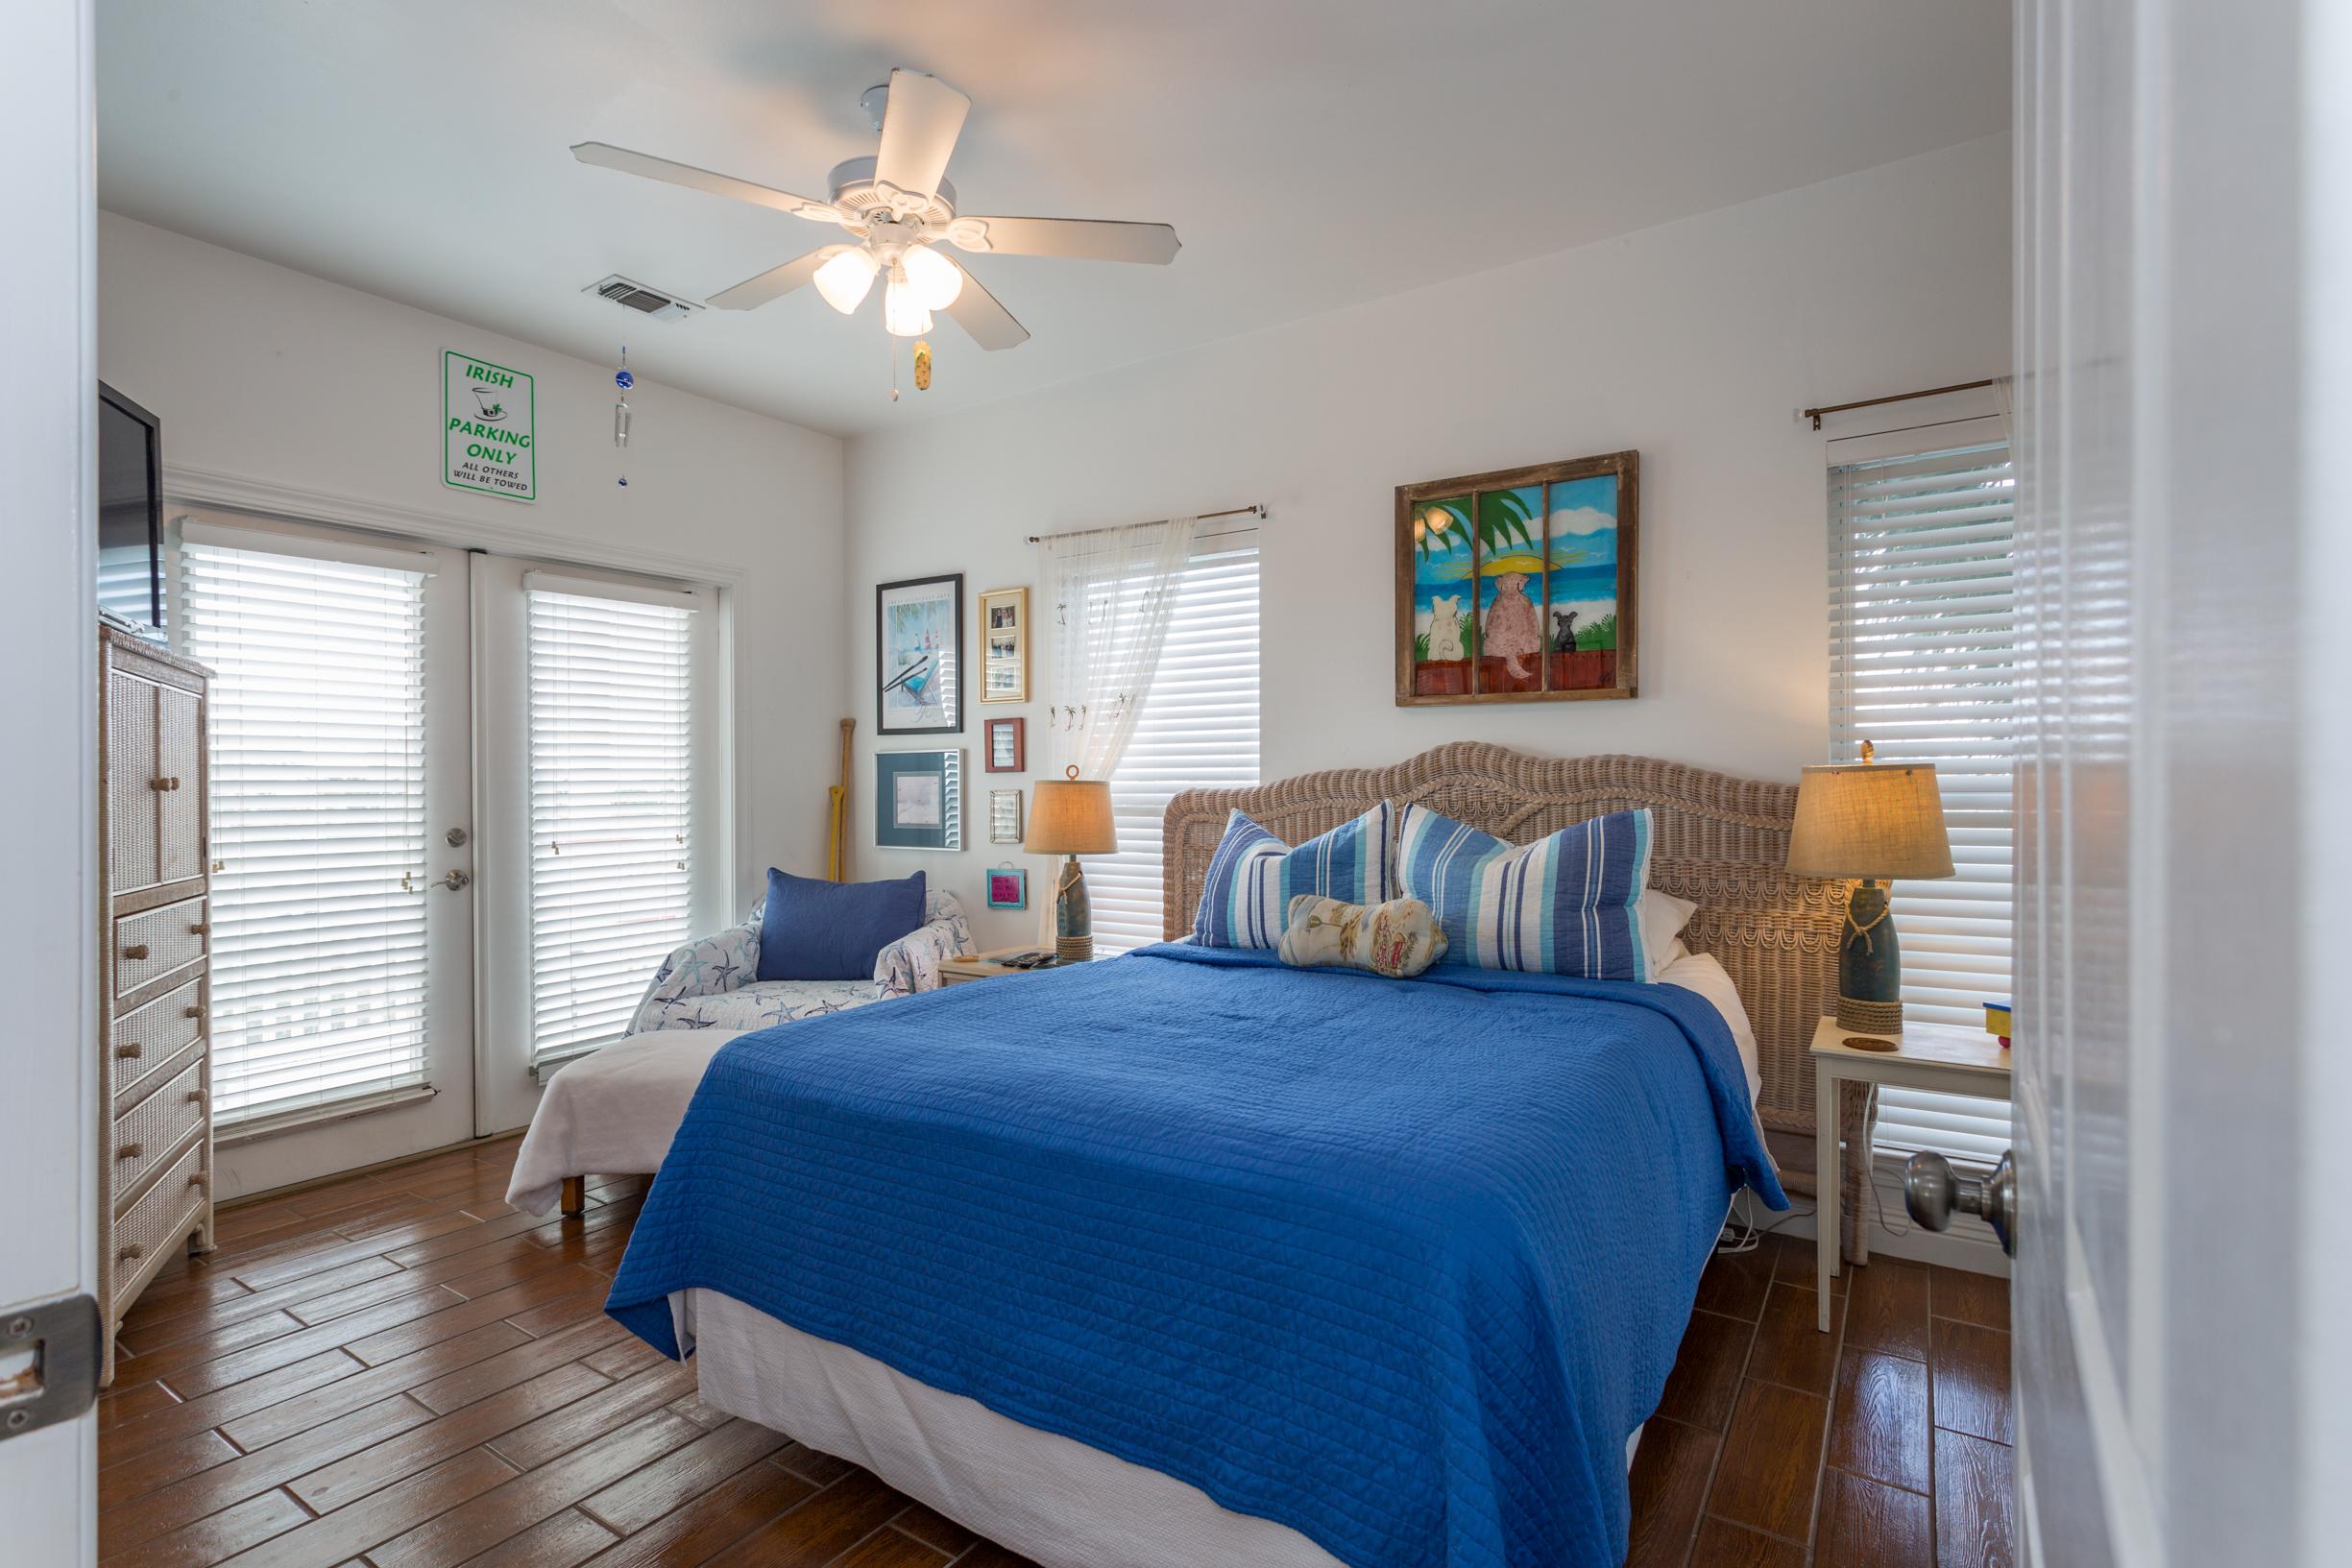 White Sands Cottage 501 Life's a Beach House Townhouse rental in White Sands Pensacola Beach in Pensacola Beach Florida - #19